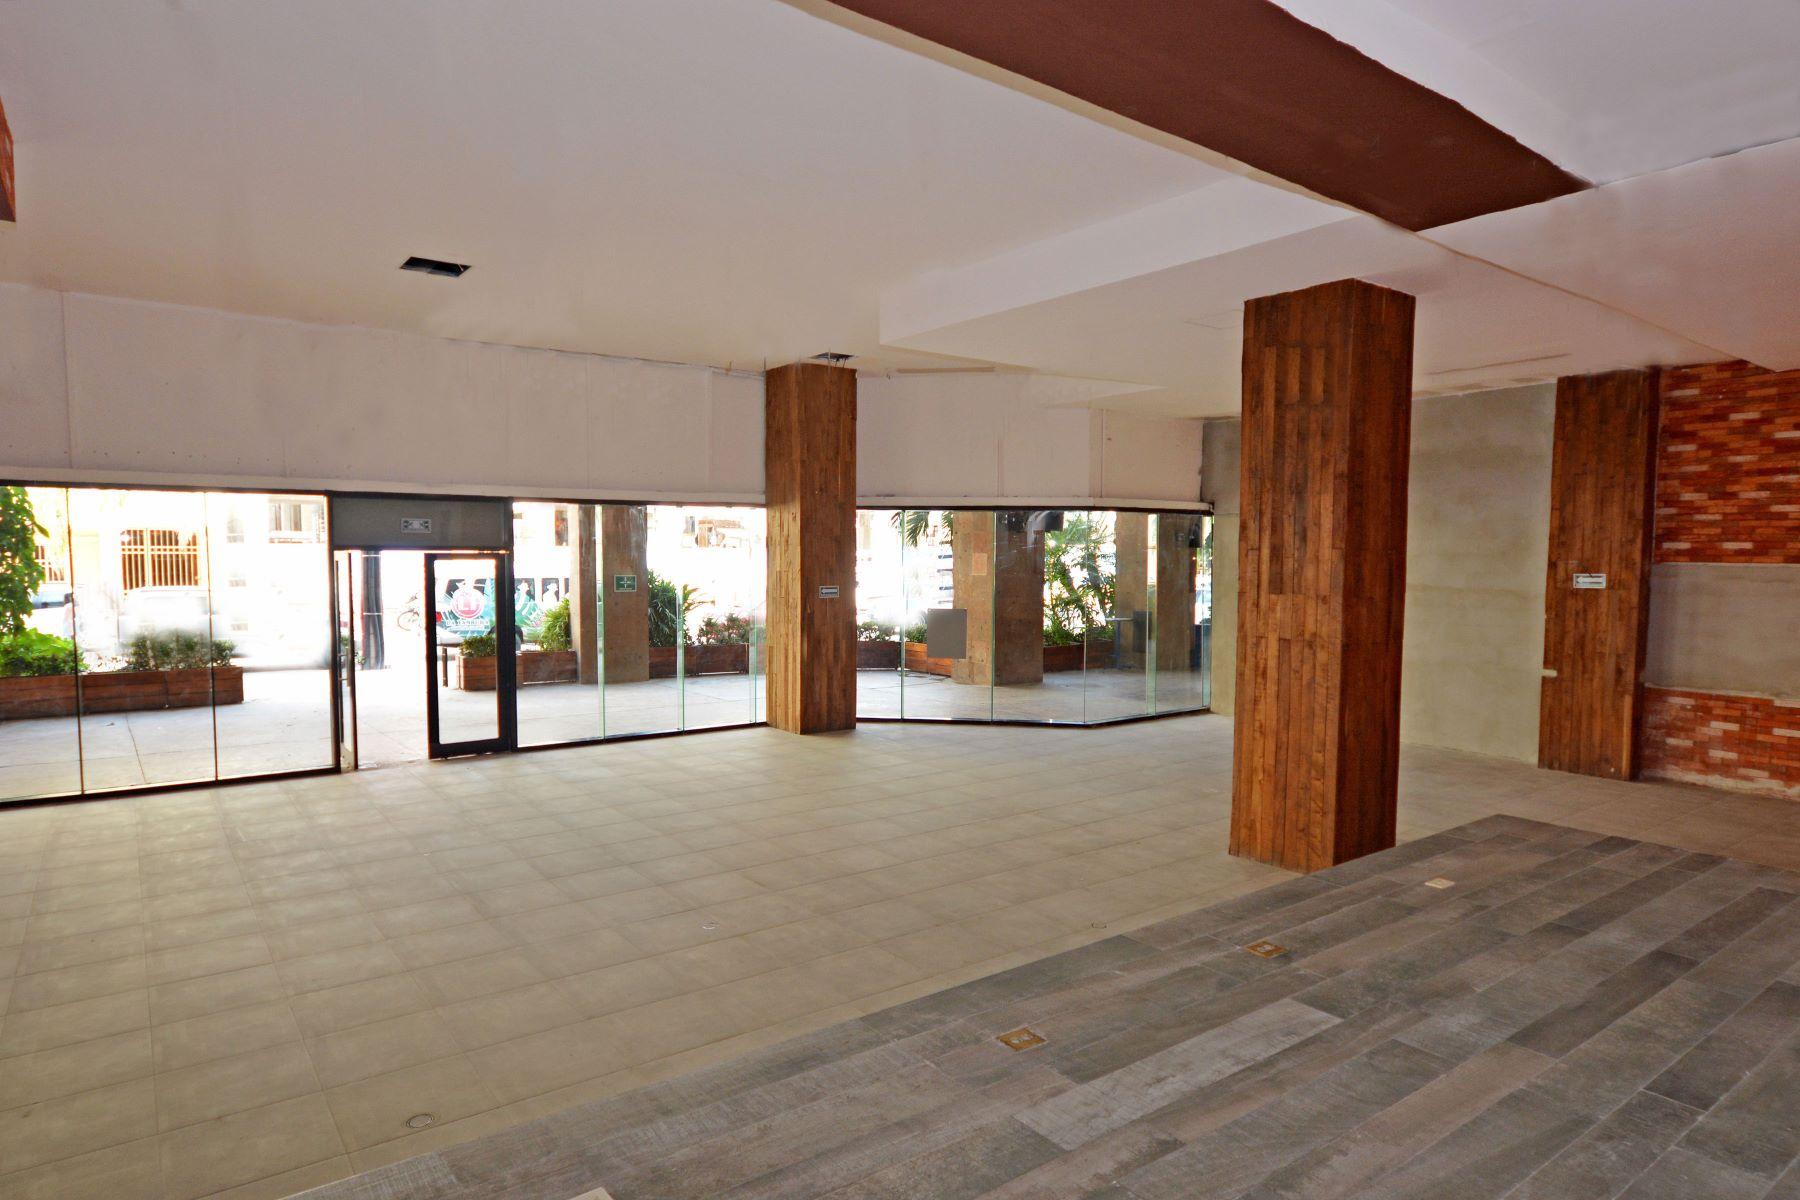 Additional photo for property listing at ALDEA THAI 22 COMMERCIAL SPACE Aldea Thai #22 Avenida Cozumel entre las Calles 26 y 28 Norte Playa Del Carmen, Quintana Roo 77710 Mexico